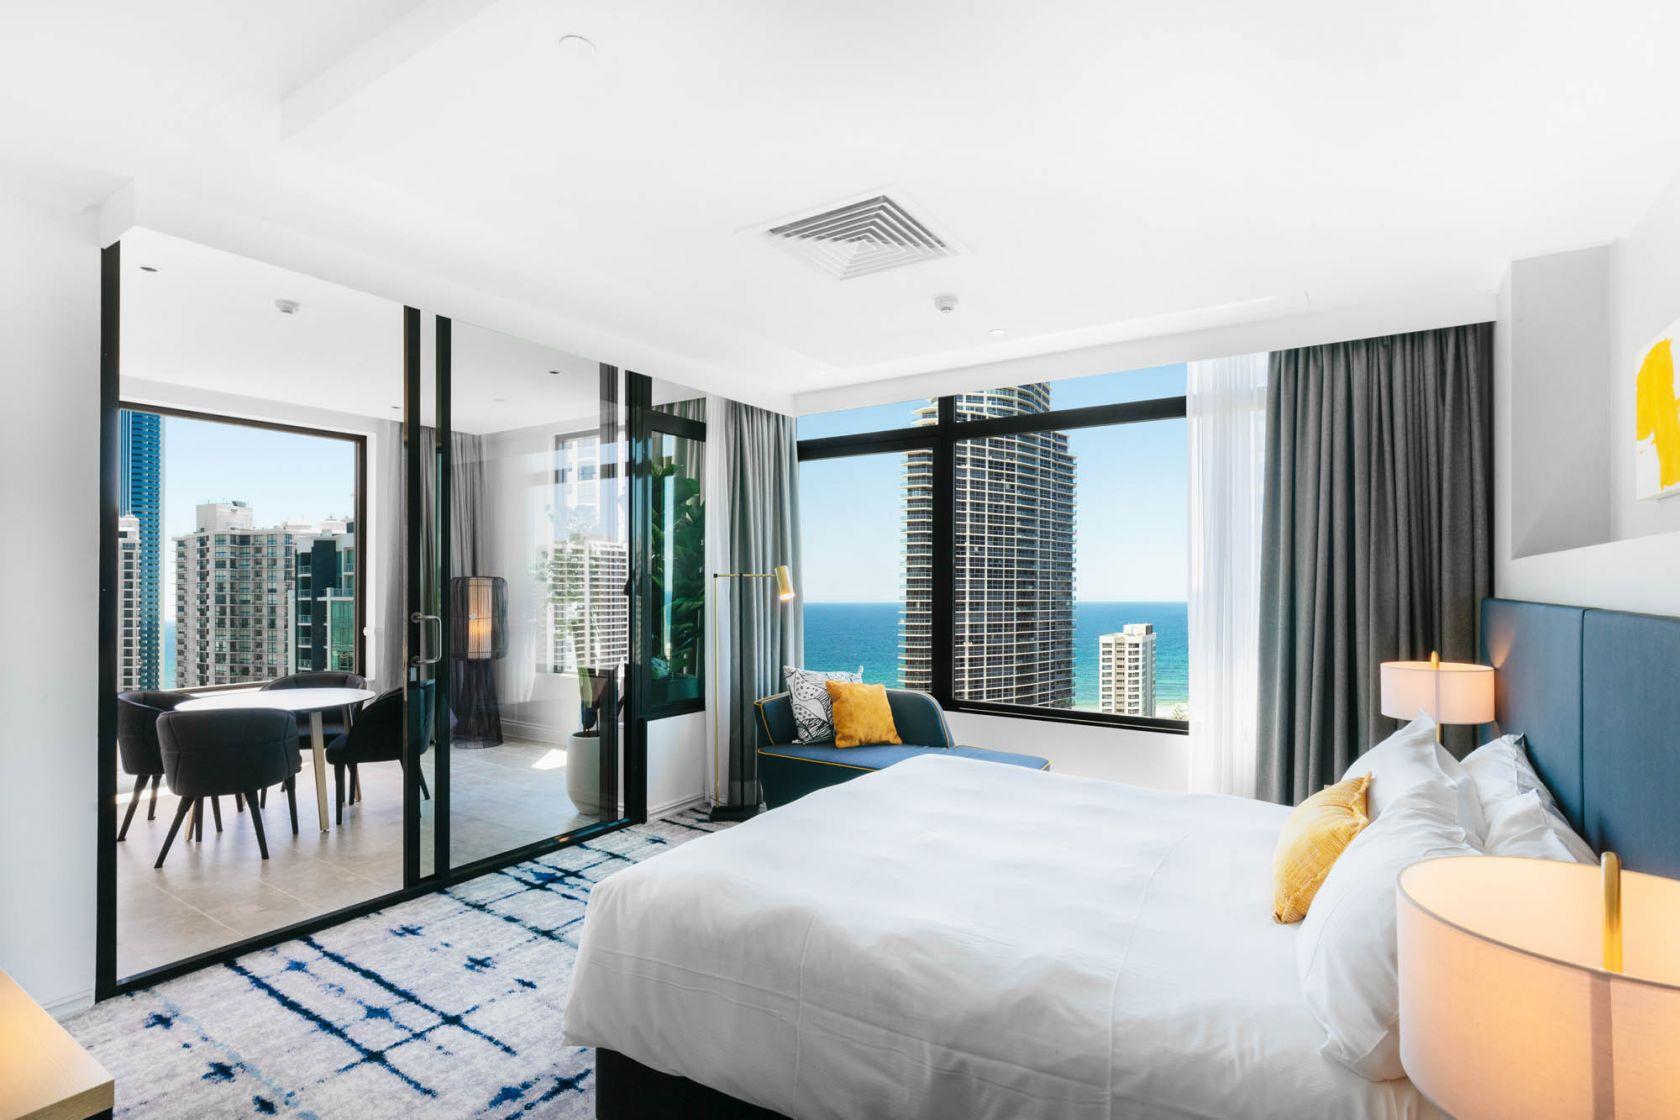 voco hotel gold coast fitout refurbishment construction executive suite bedroom terrace